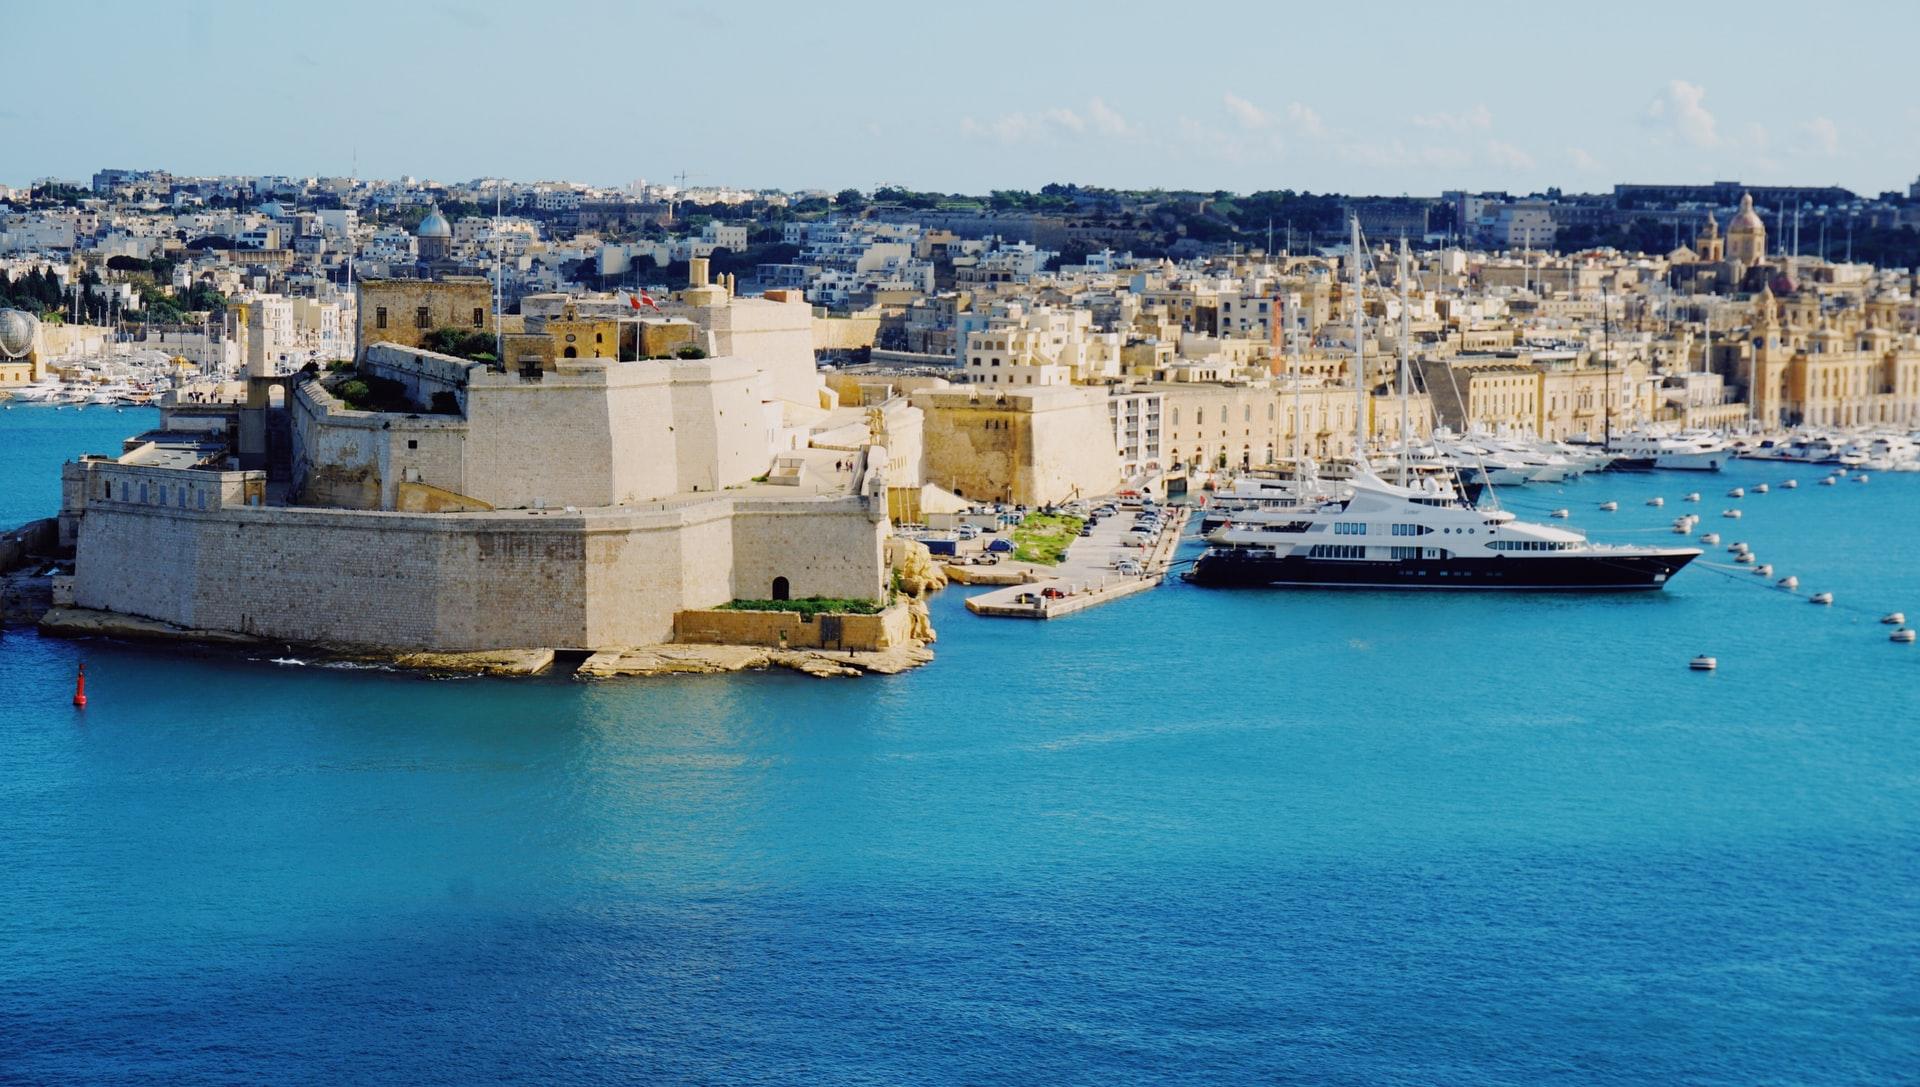 Is Malta the Tech Hub of Europe?